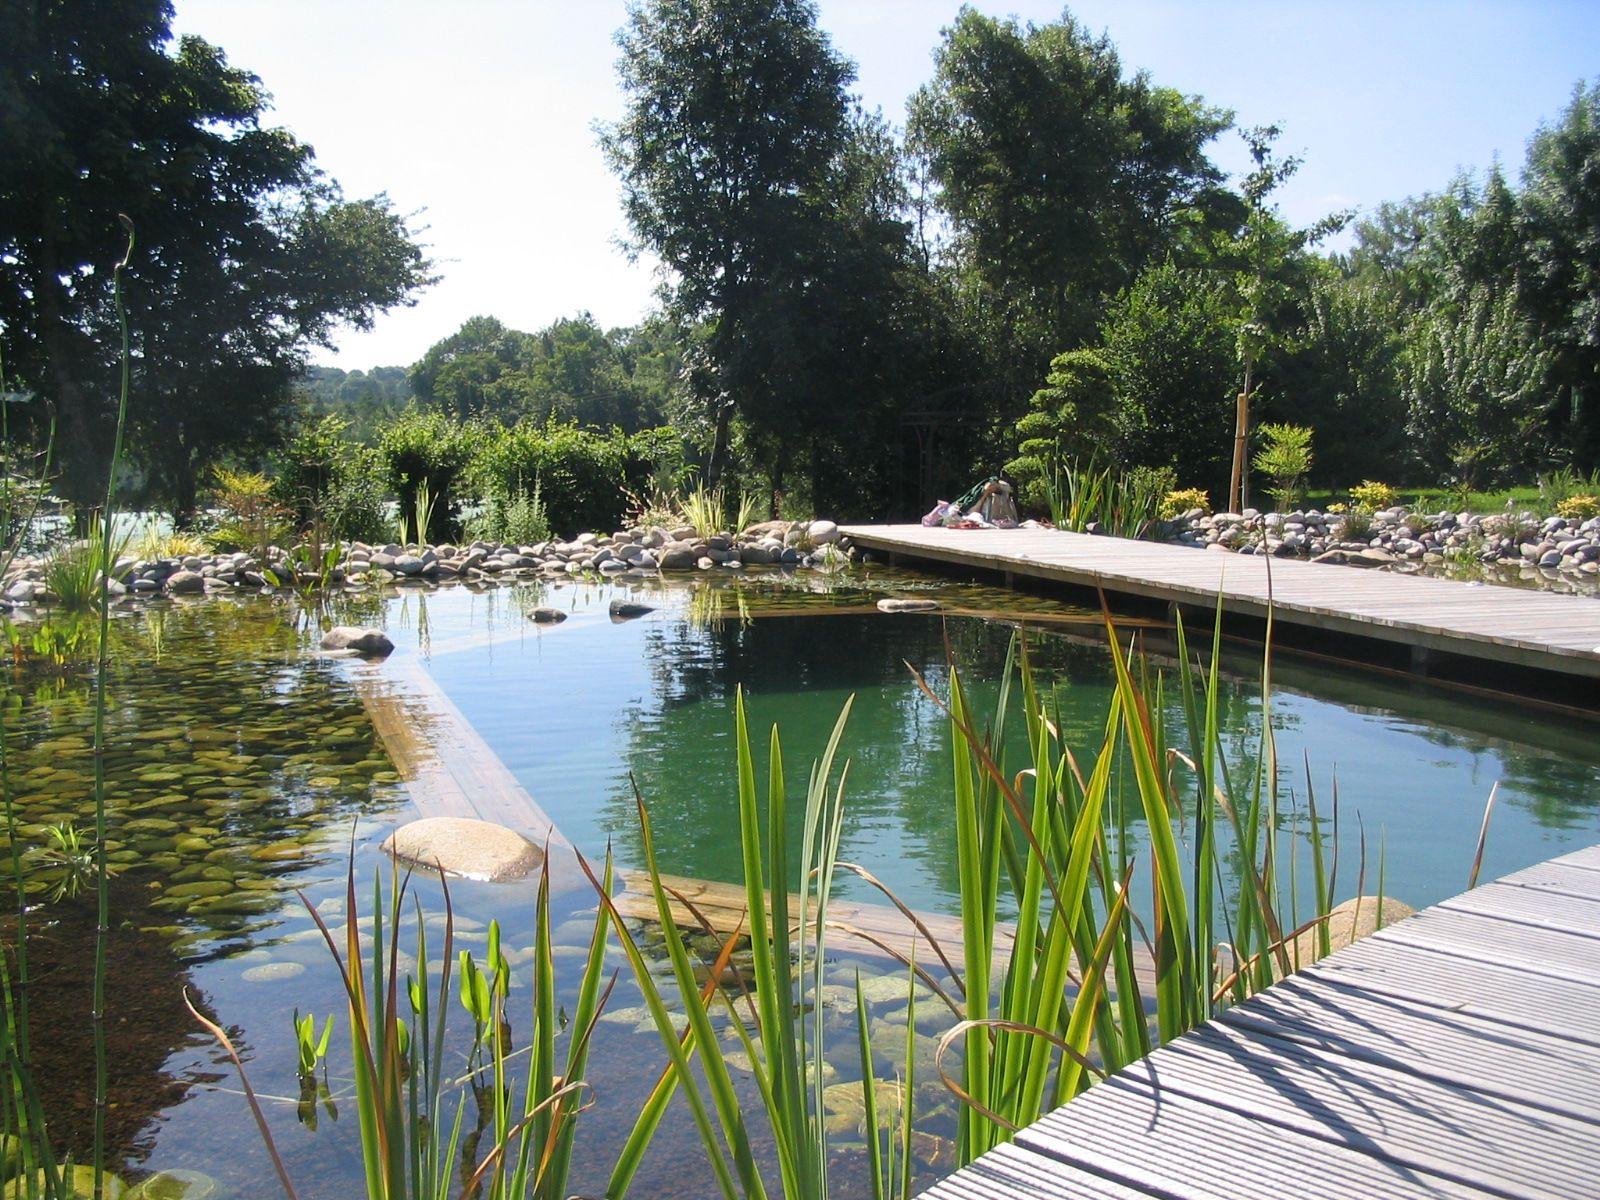 rebeyrol, rebeyrol créateur de jardins, bassin baignade, bassin